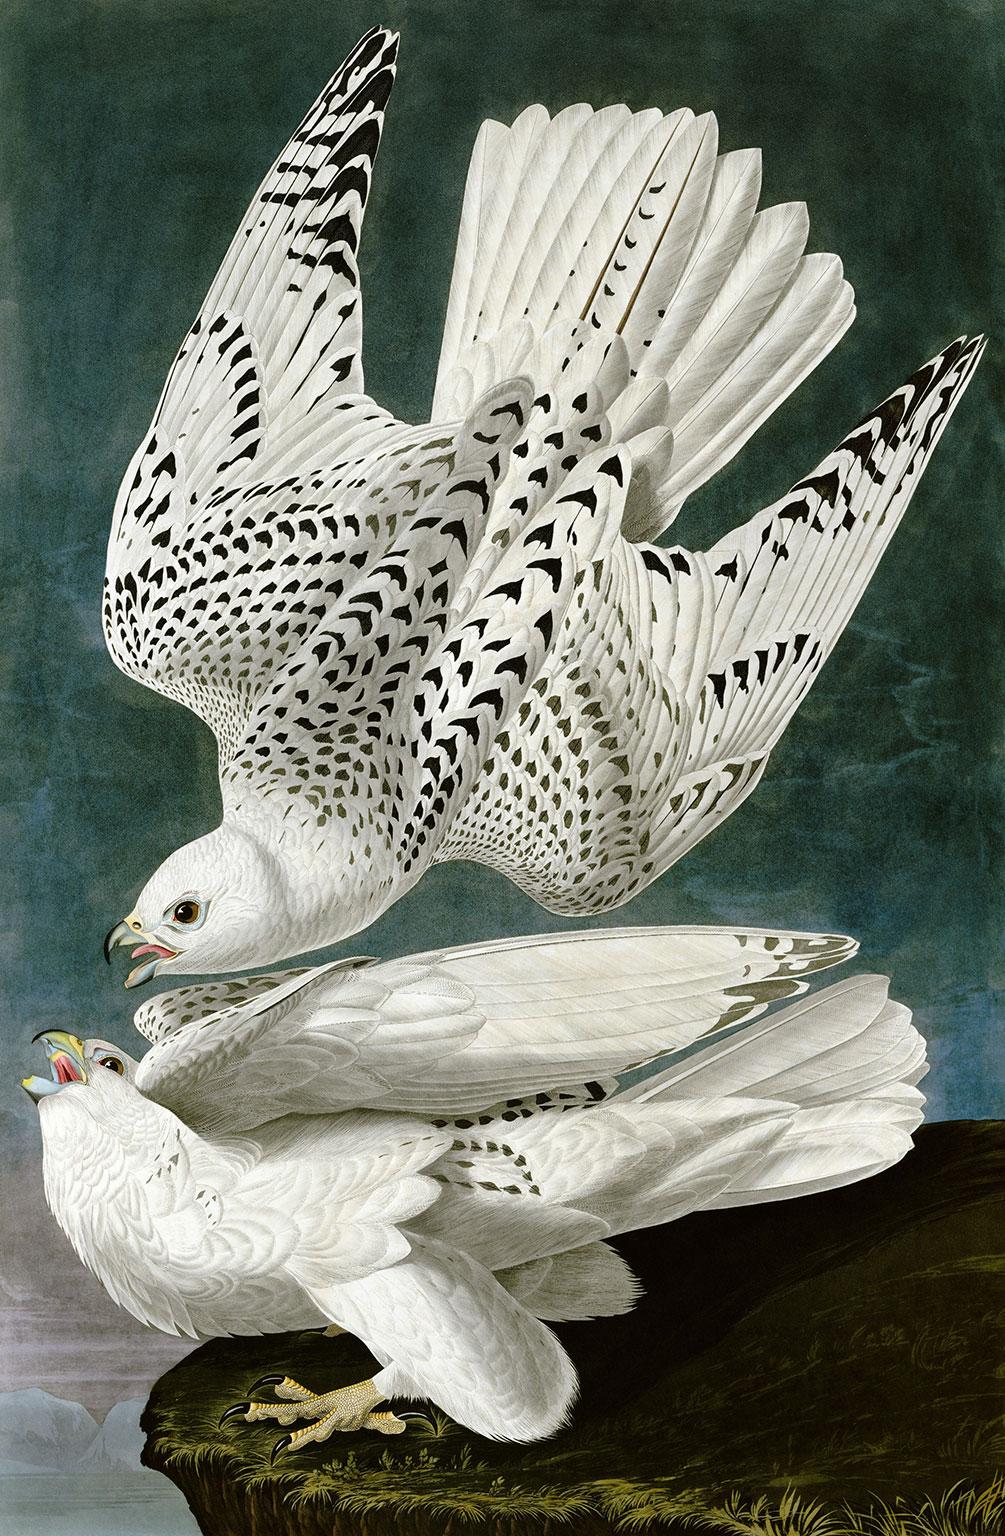 Two white gyrfalcons by Audubon.